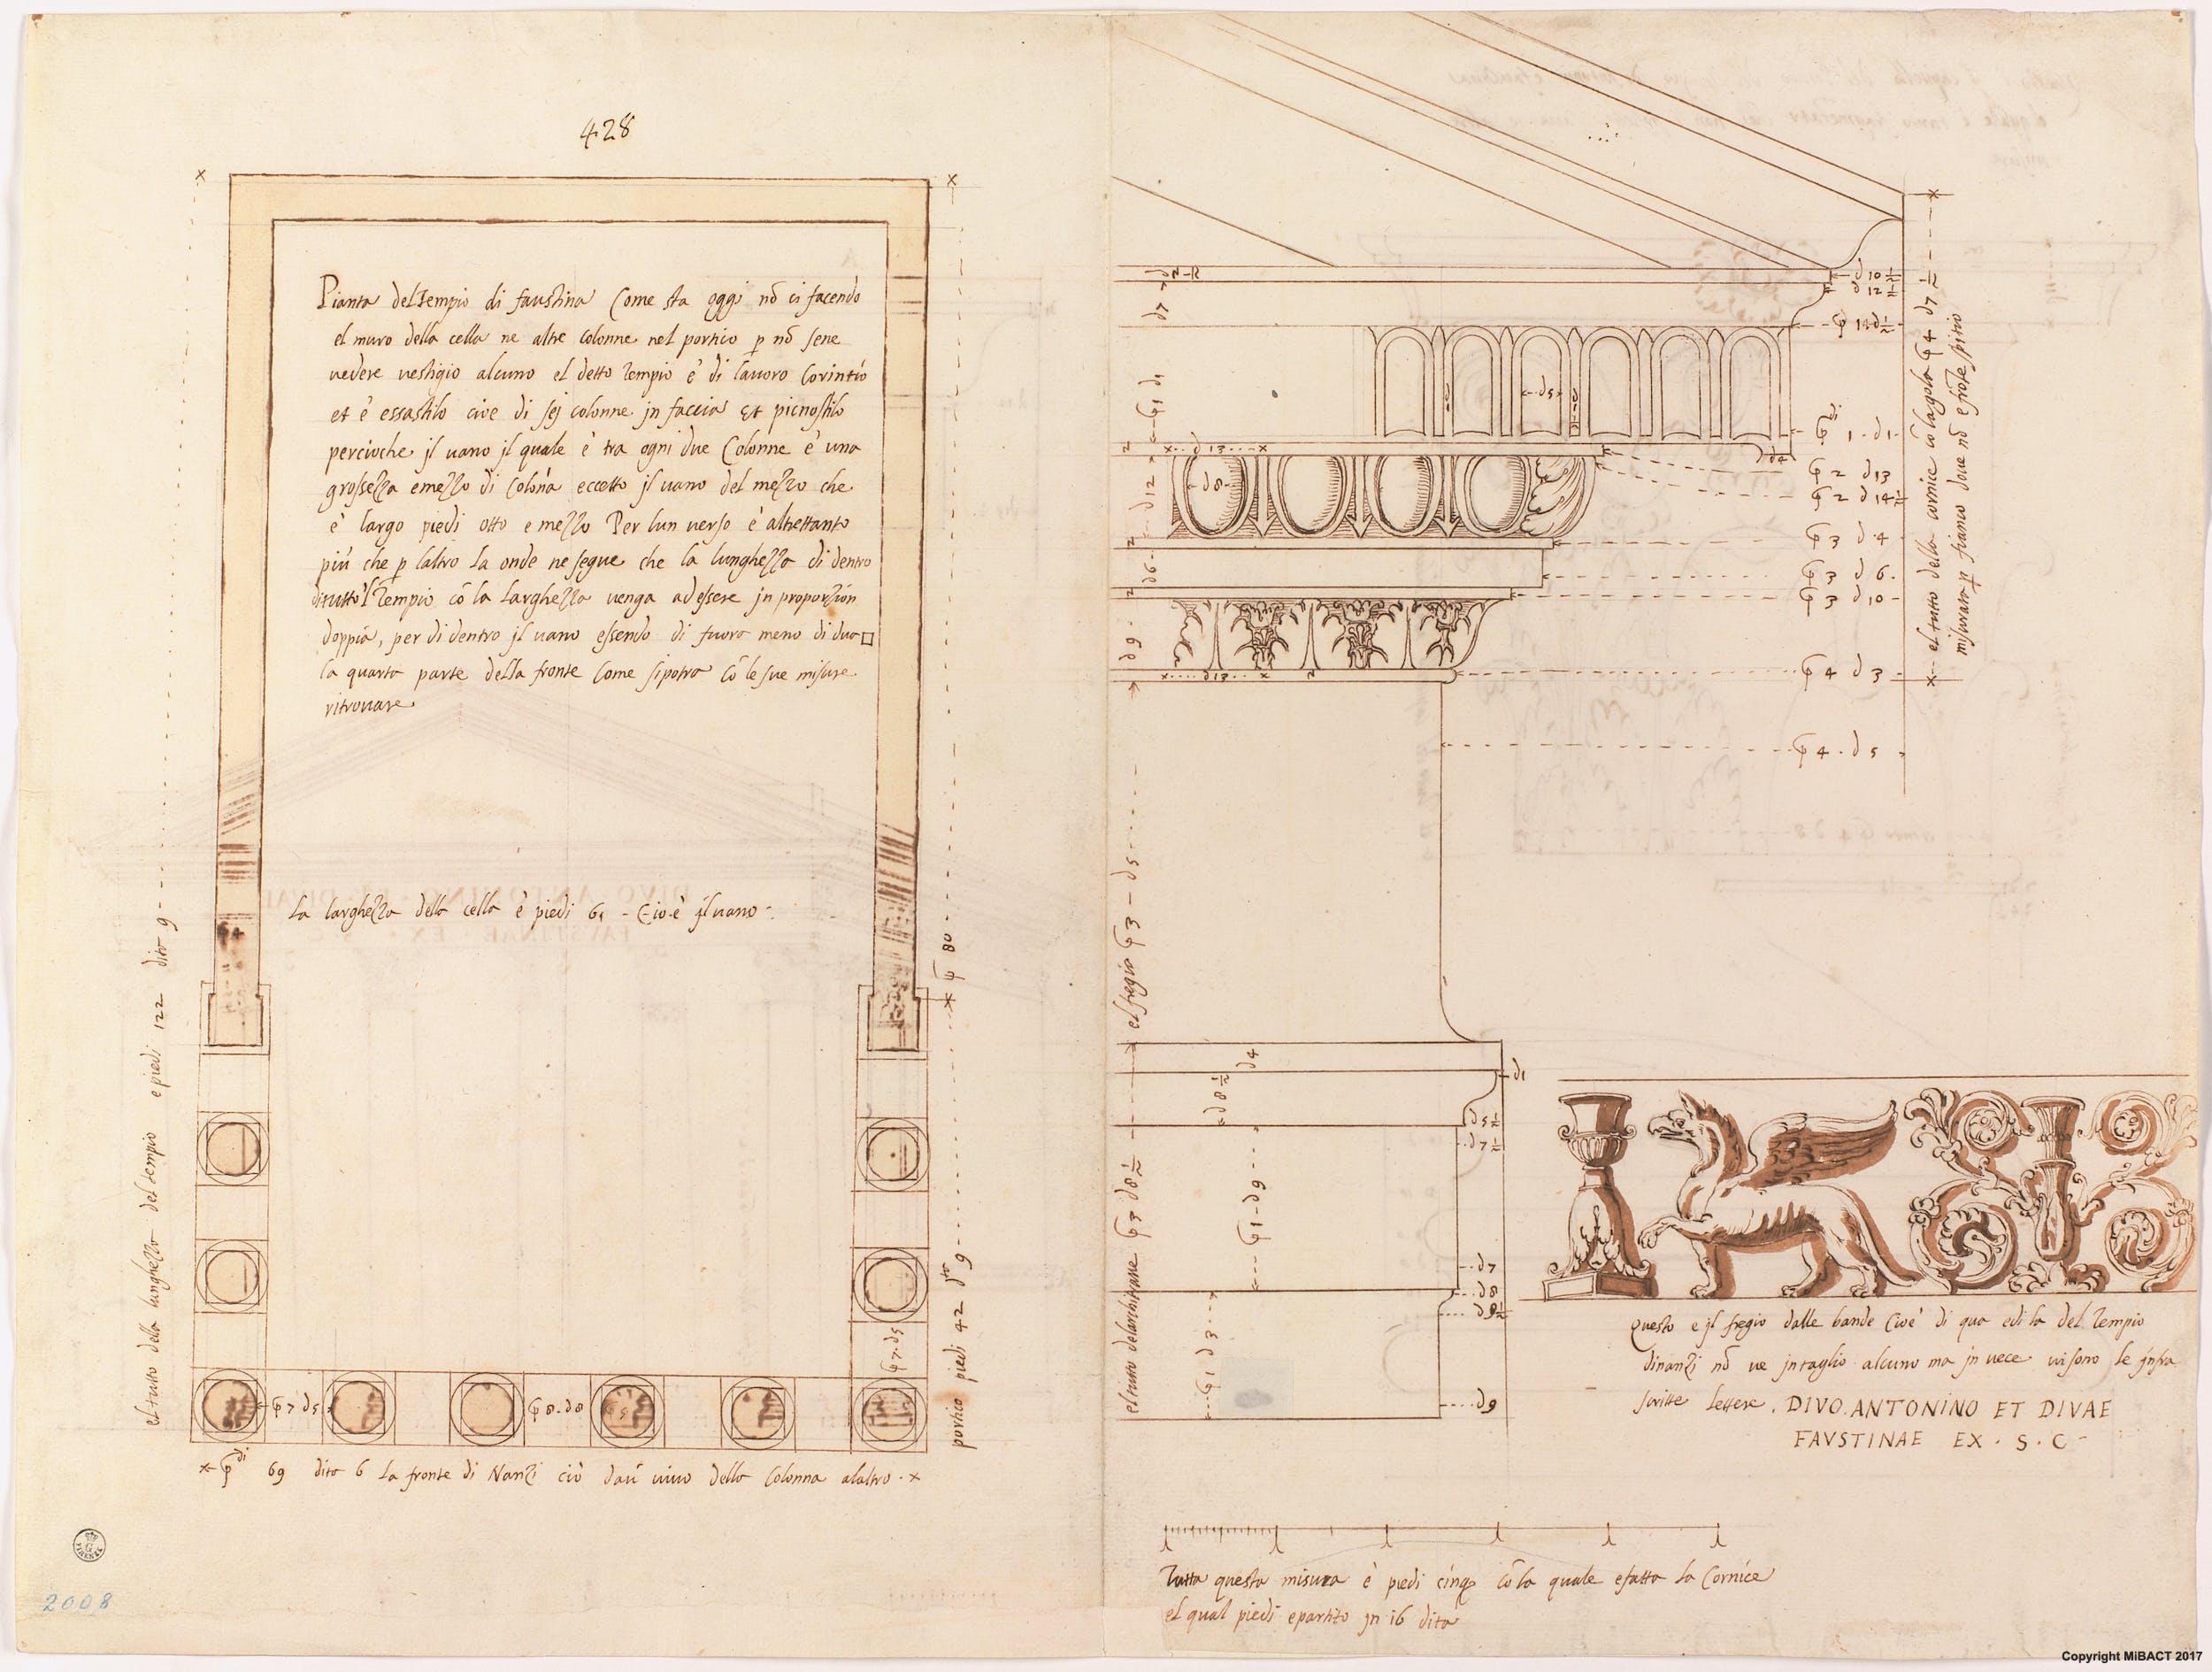 Tempio di Antonino e Faustina, recto